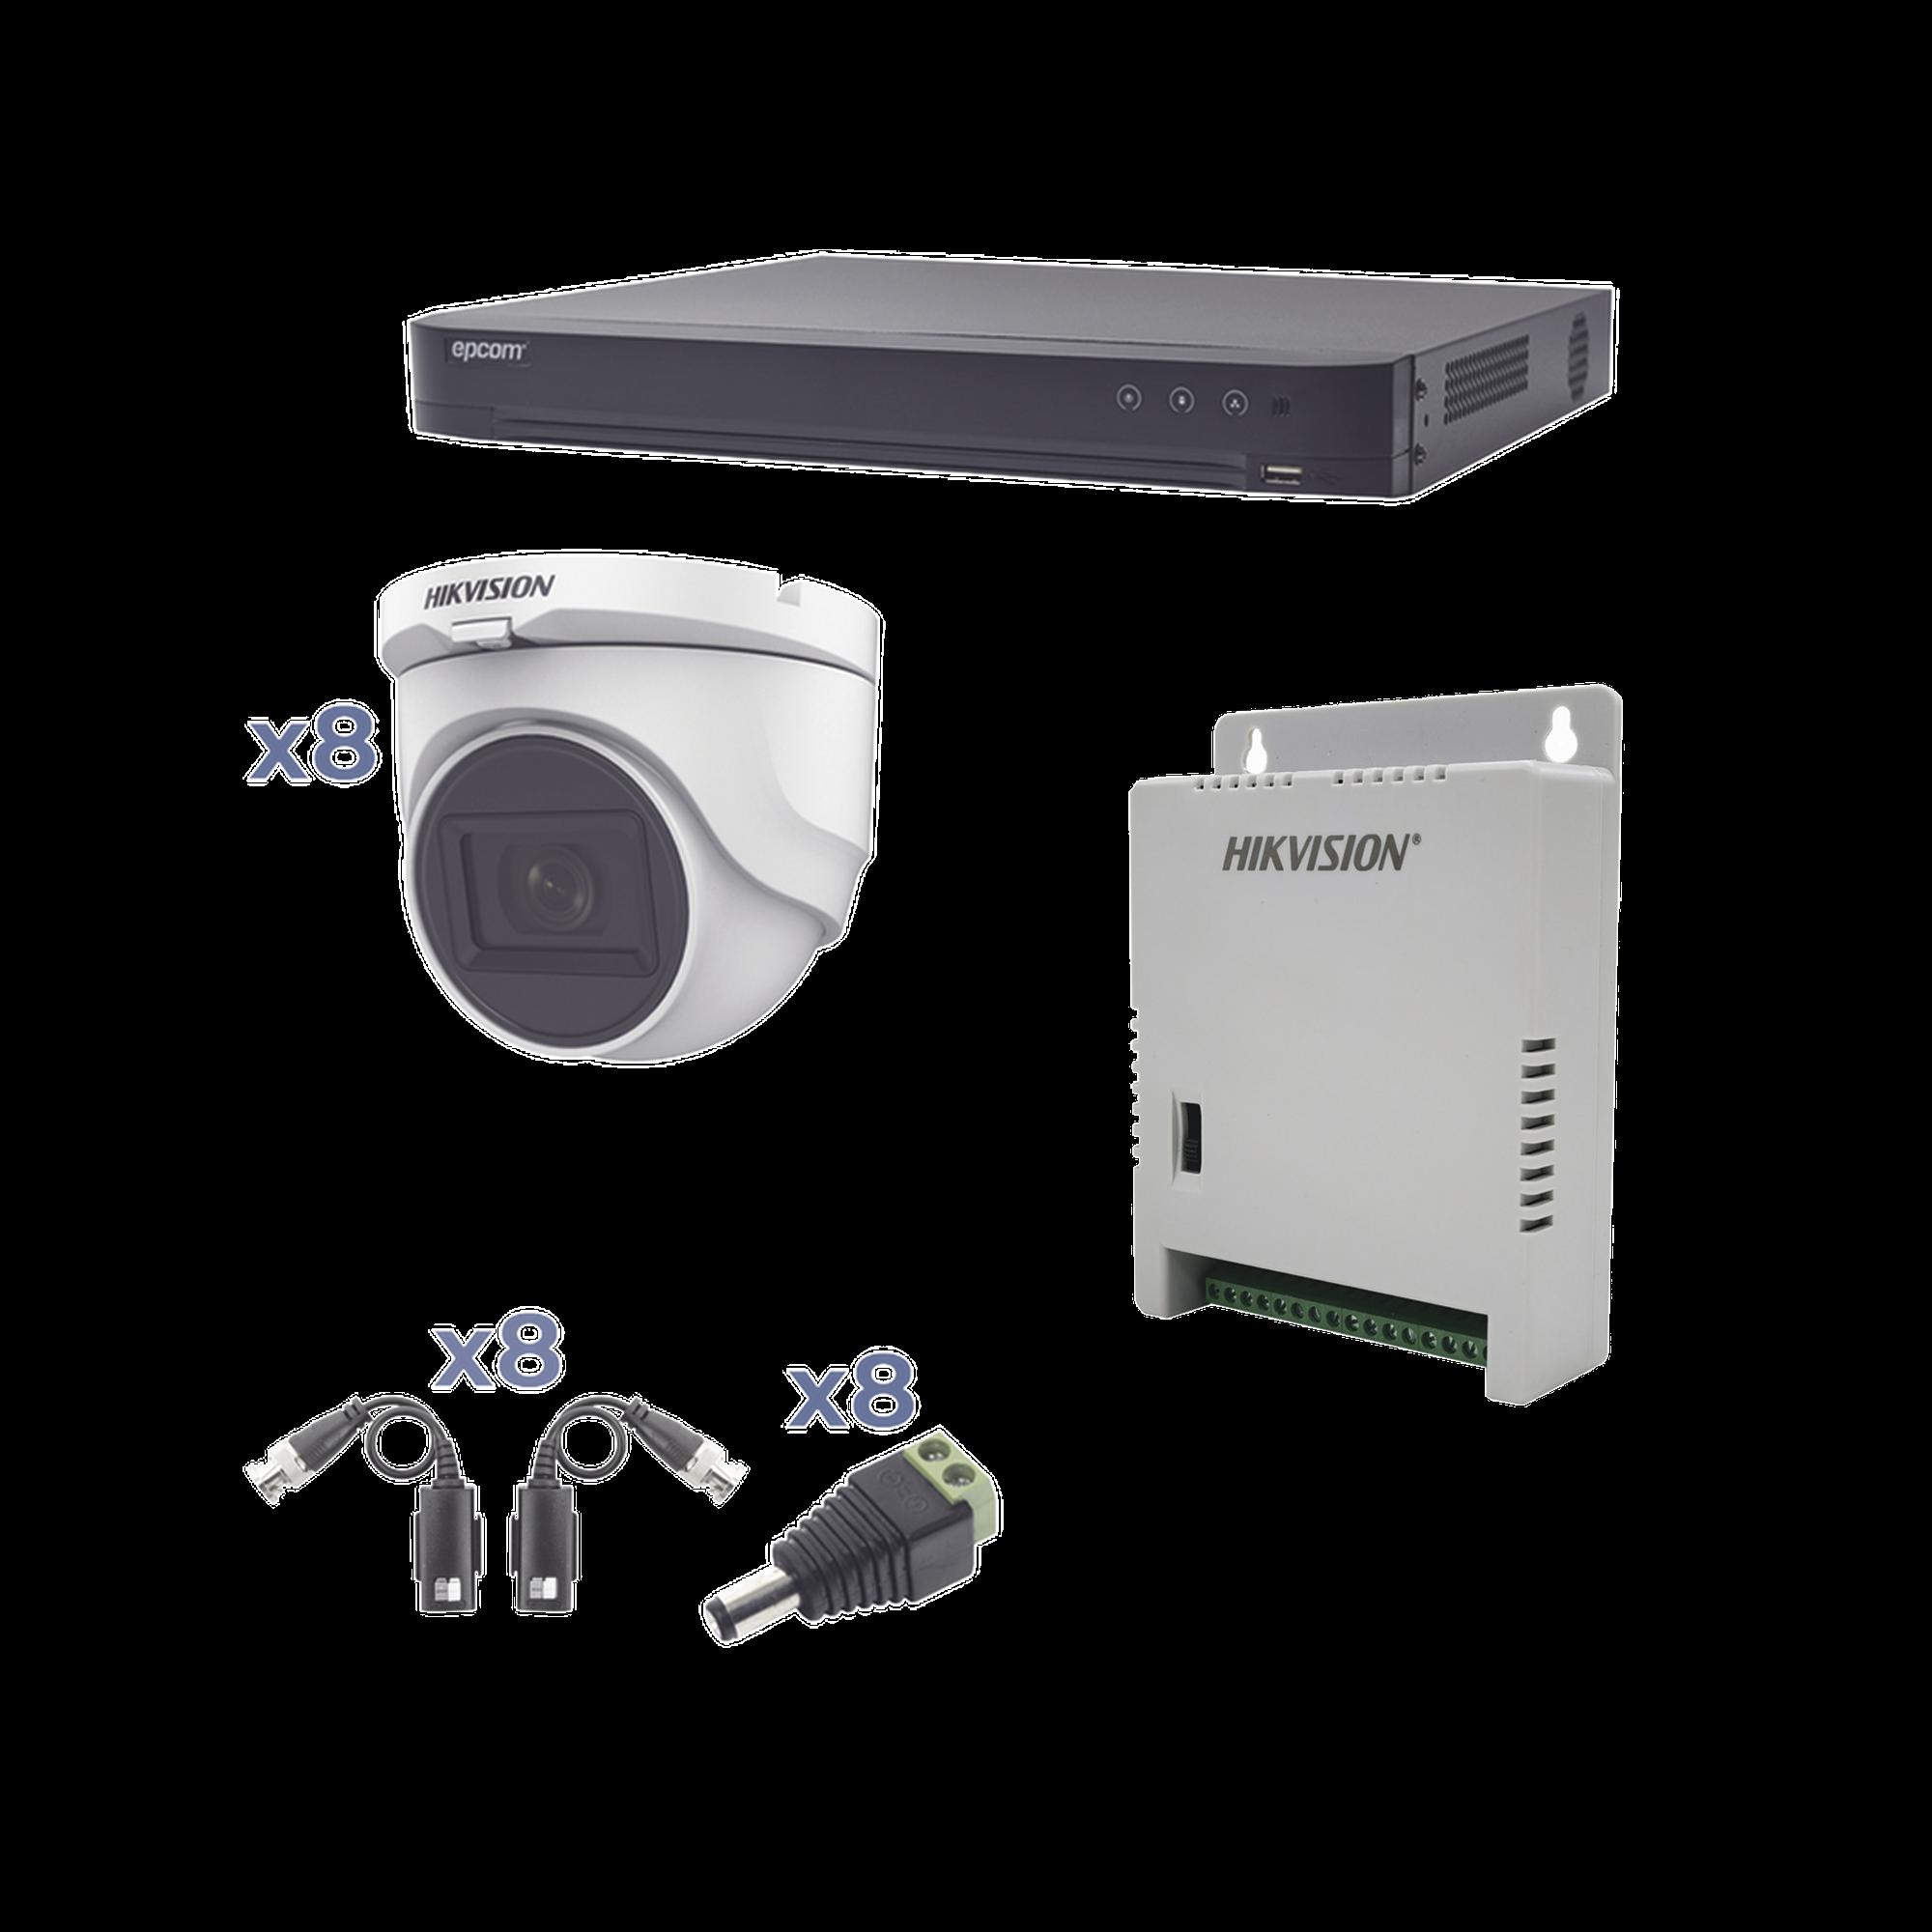 Kit TURBOHD 1080p / DVR 8 Canales / 8 Cámaras Turret (exterior 2.8 mm) / Conectores / Transceptores / Fuente de Poder Profesional hasta 15 Vcd para Larga Distancia